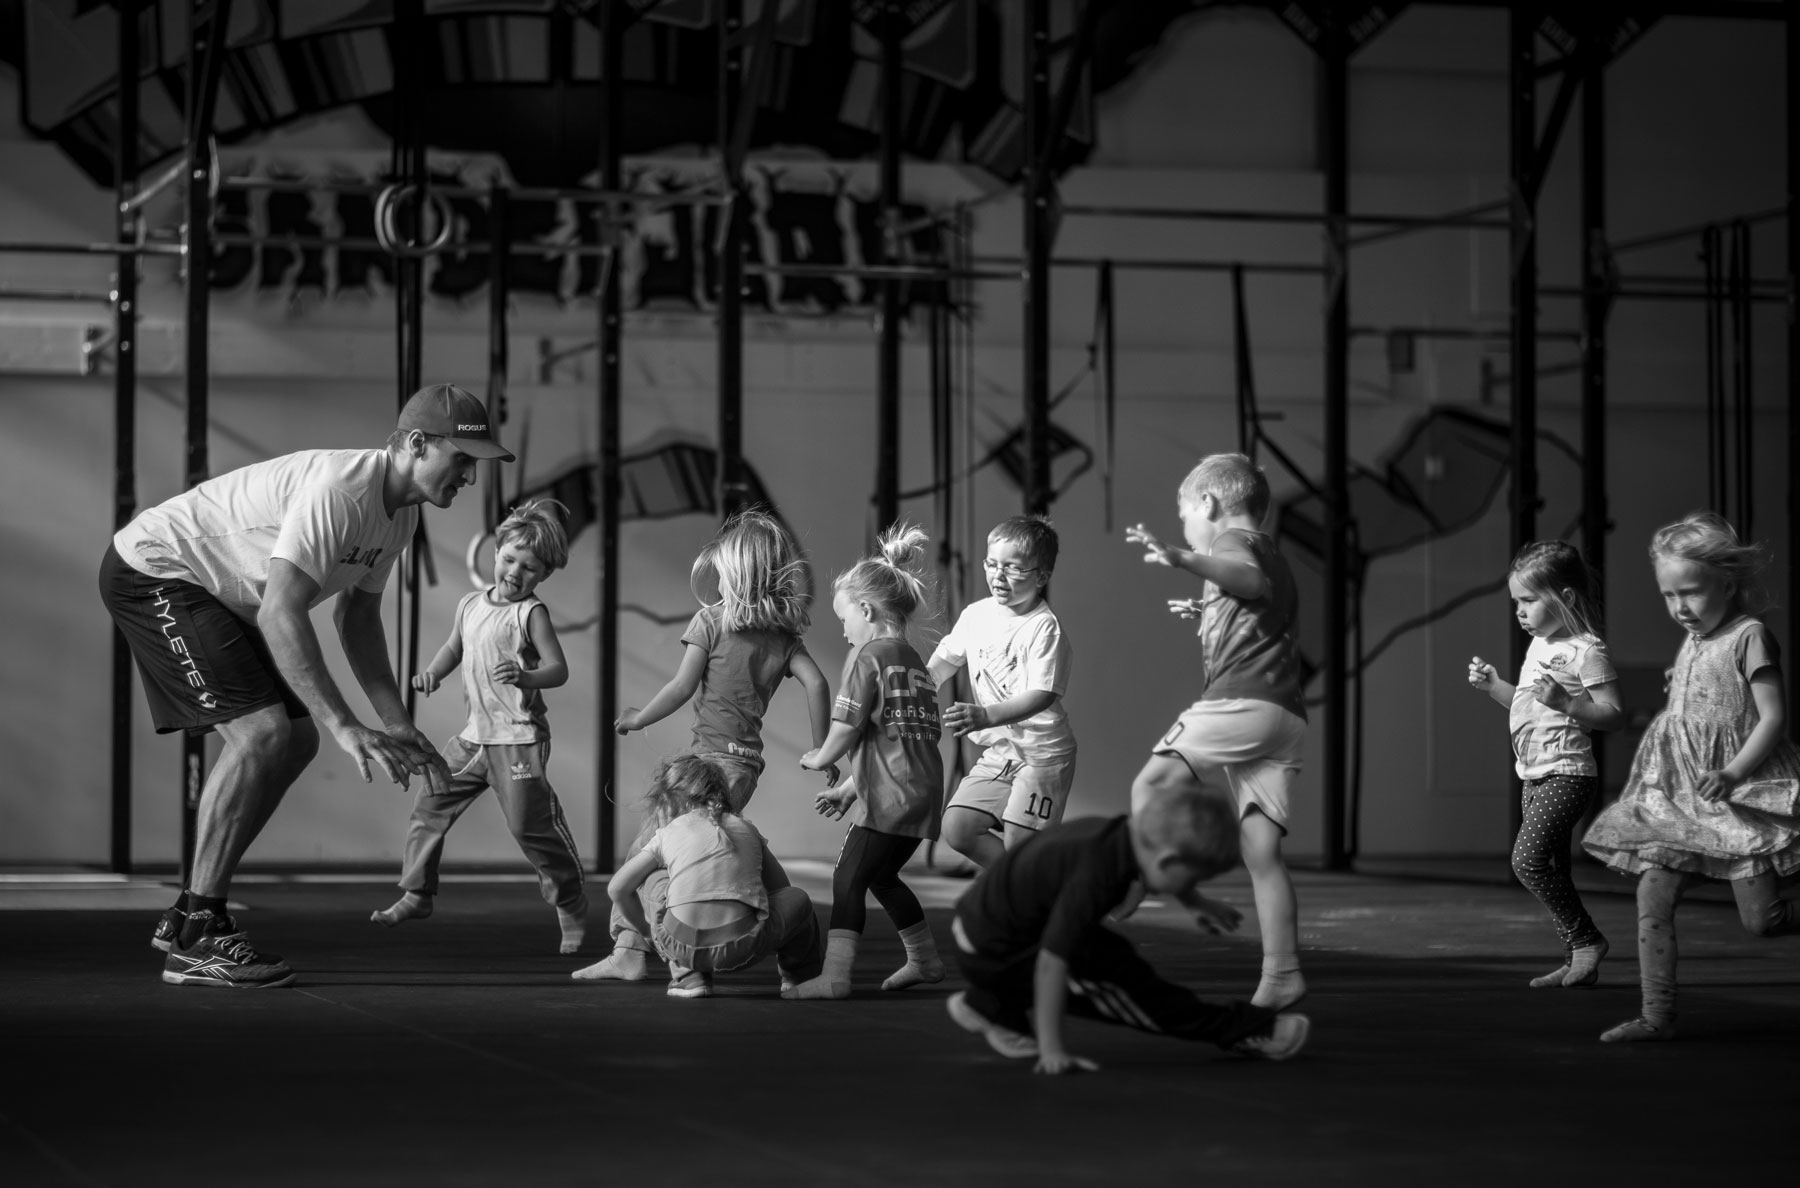 Crossfit Kids & Teens under treningsøkt. Barn leker.